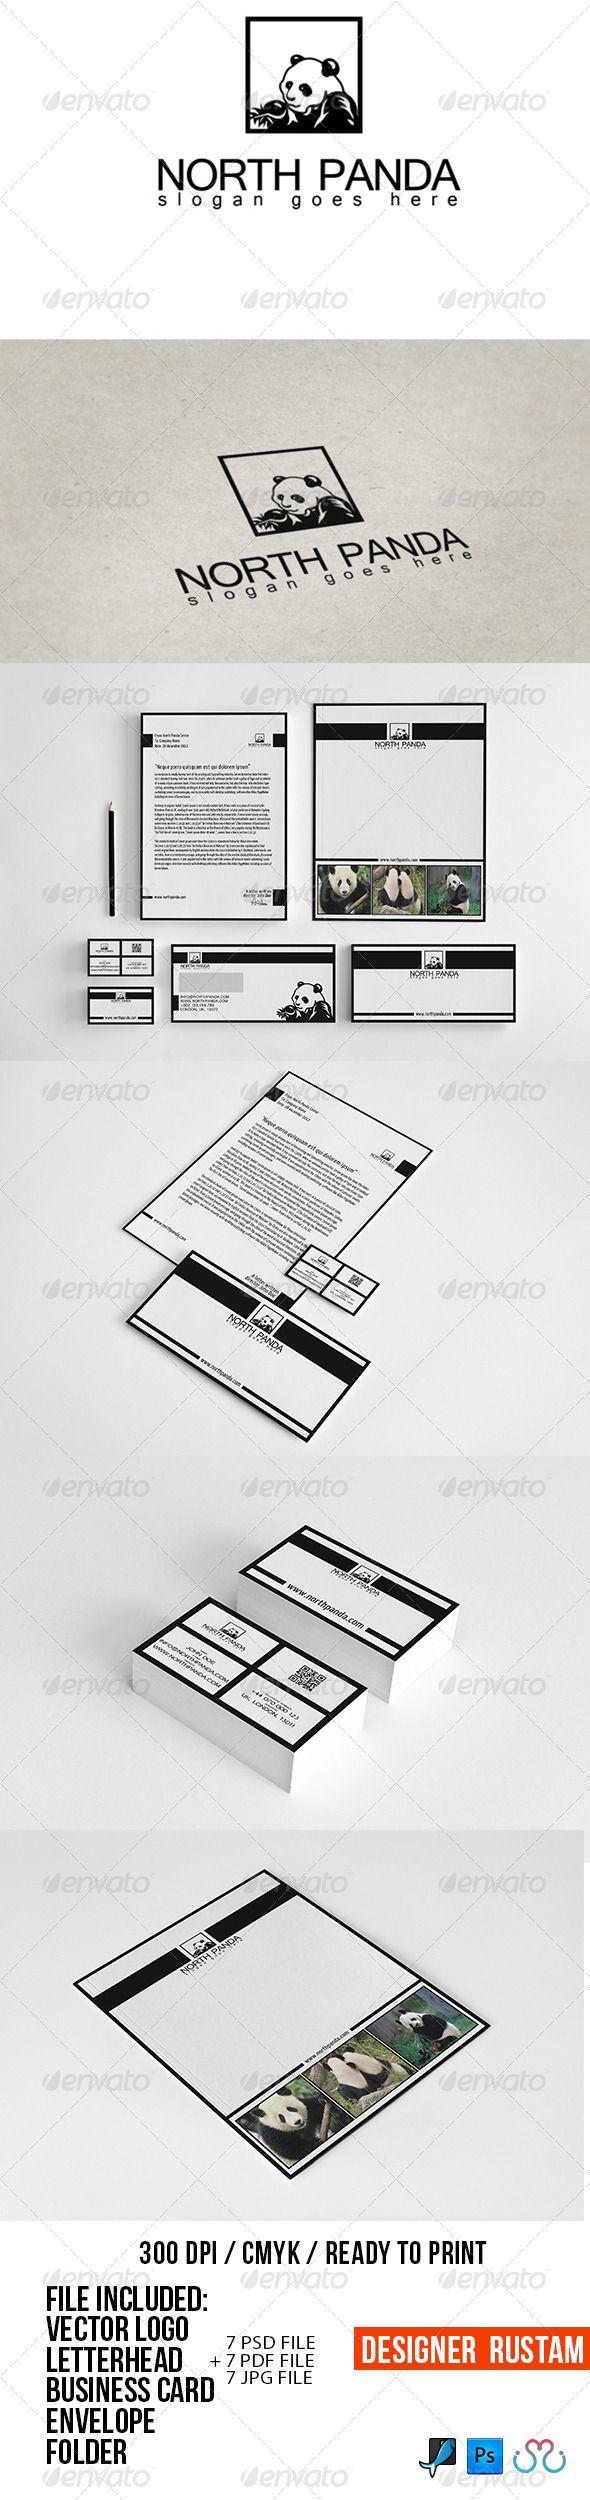 101 best Print Templates images on Pinterest | Print templates, Font ...